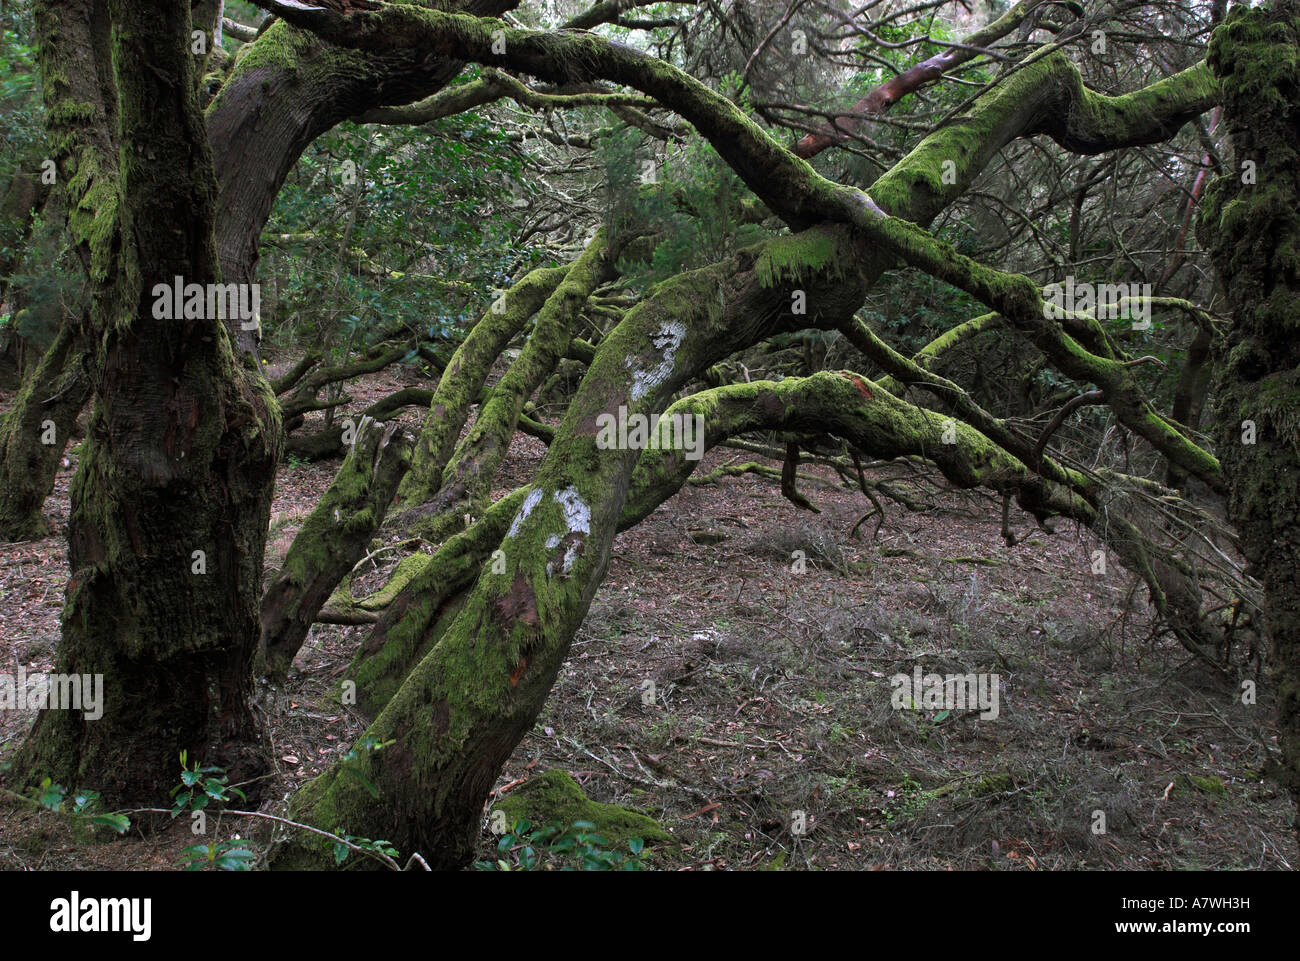 Virgin laurel forest in Garajonay national park, La Gomera Island, Canary Islands, Spain, Europe Stock Photo